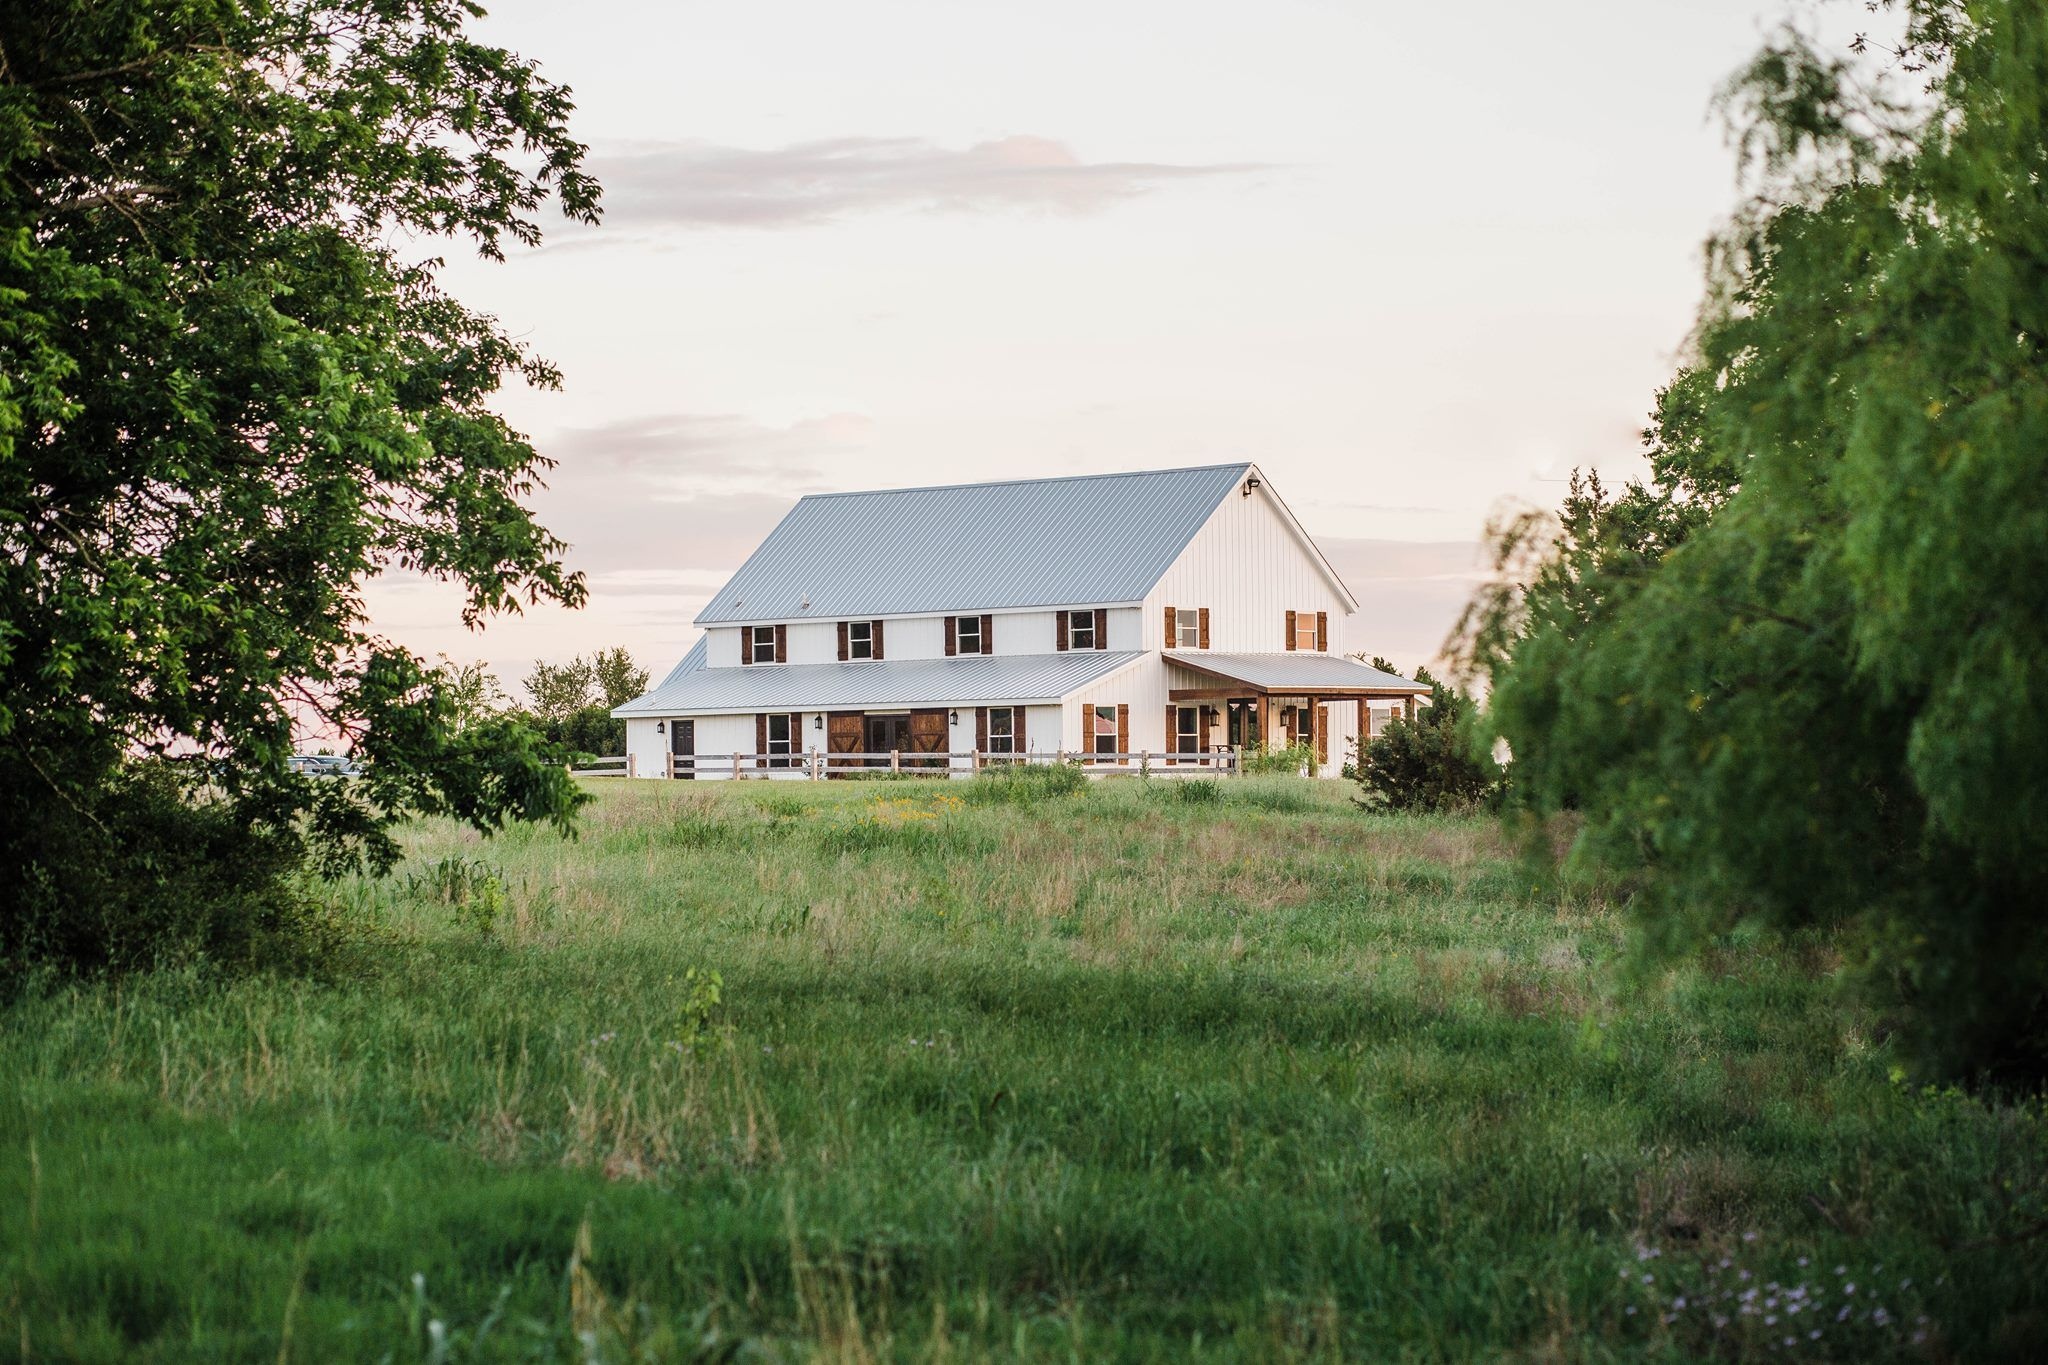 Farmhouse Style Wedding Inspiration At Five Oaks Farm Barn In Cleburne Texas